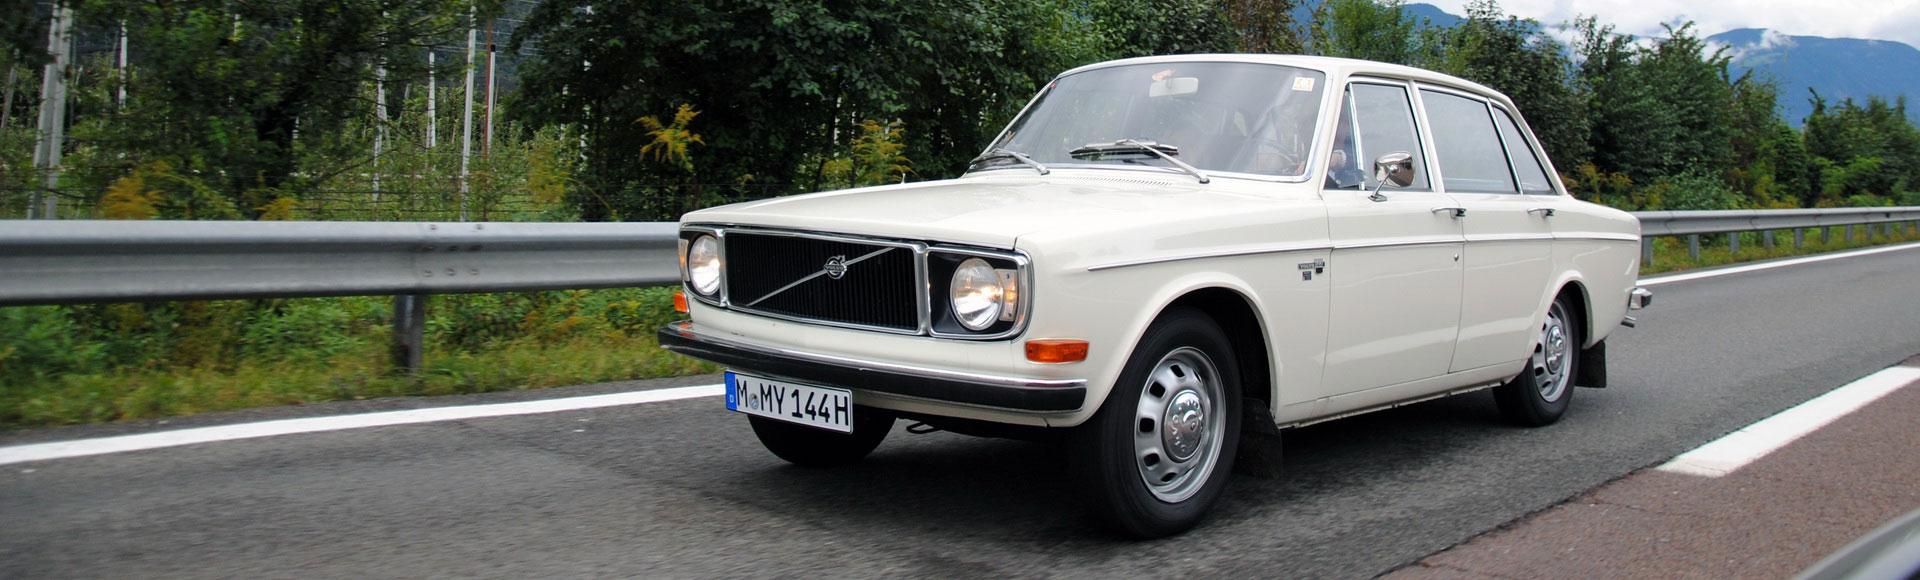 Volvo 144 1971 2298 Herbst